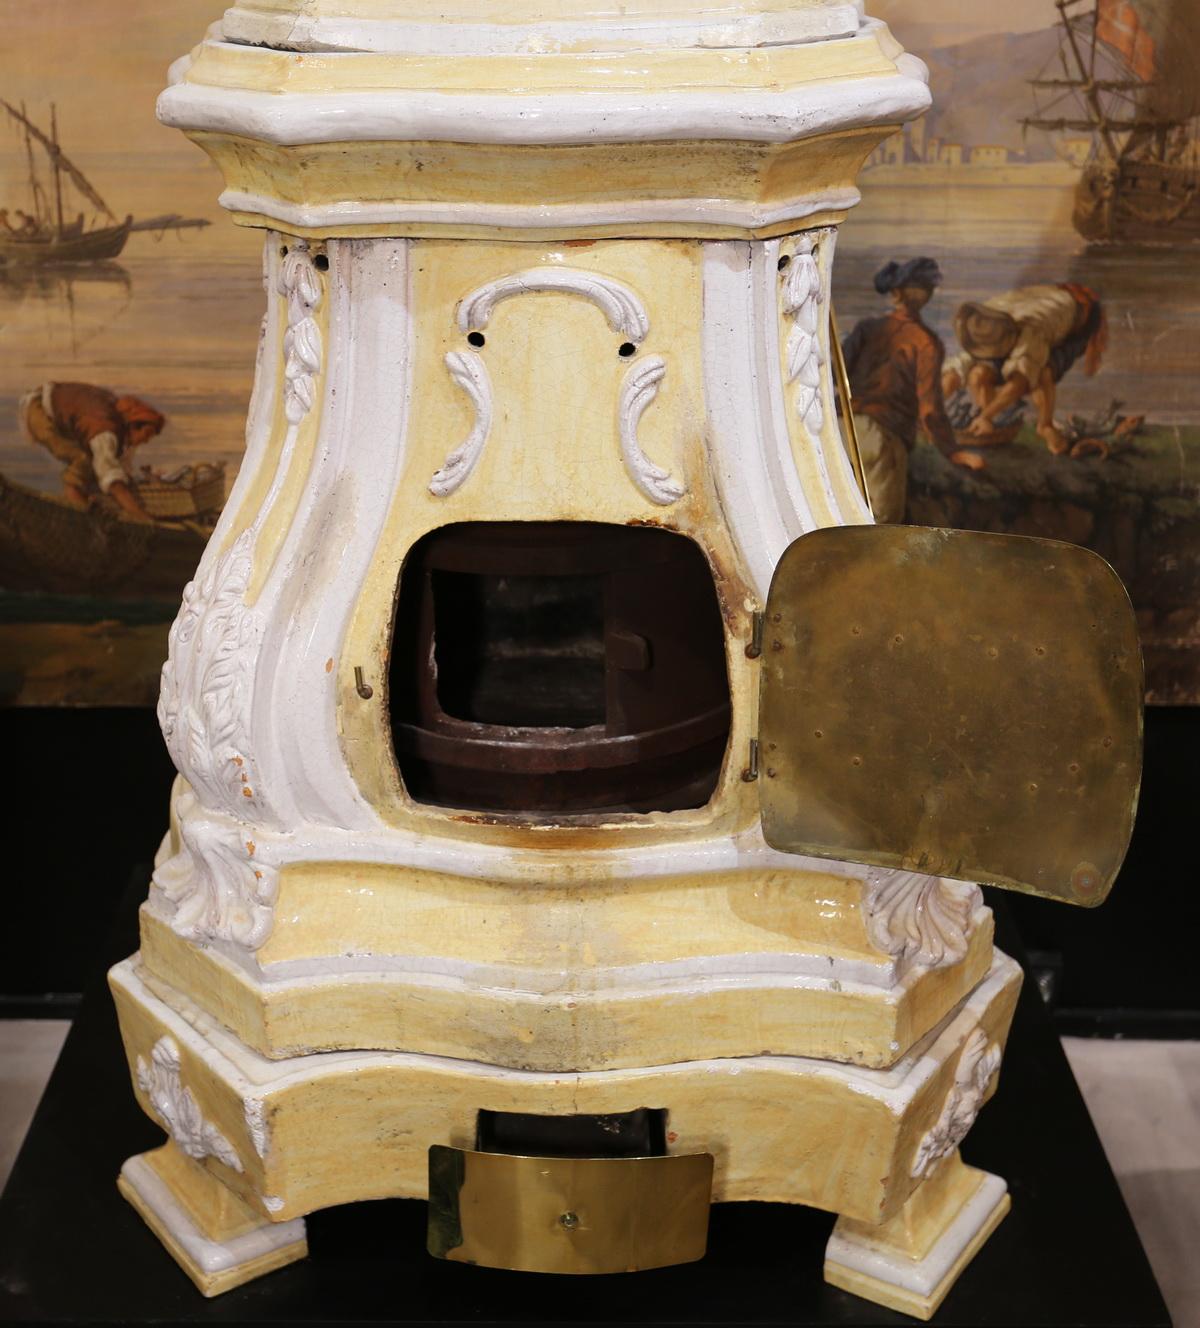 18th century earthenware stove